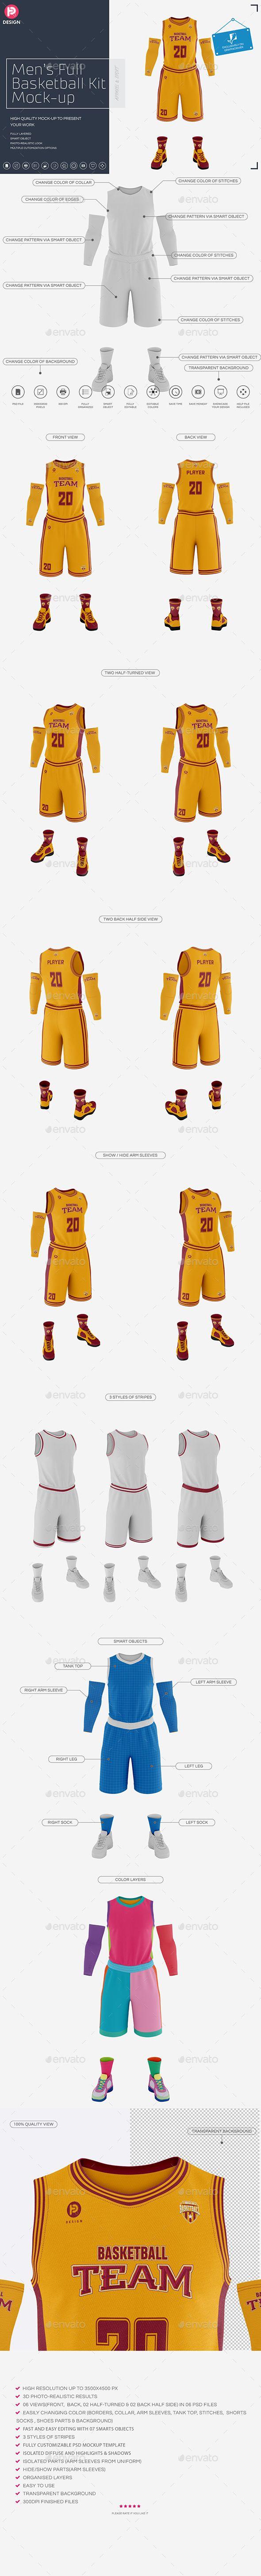 Men's Full Basketball Kit Crew-Neck Jersey #Mock-Up - Miscellaneous Apparel